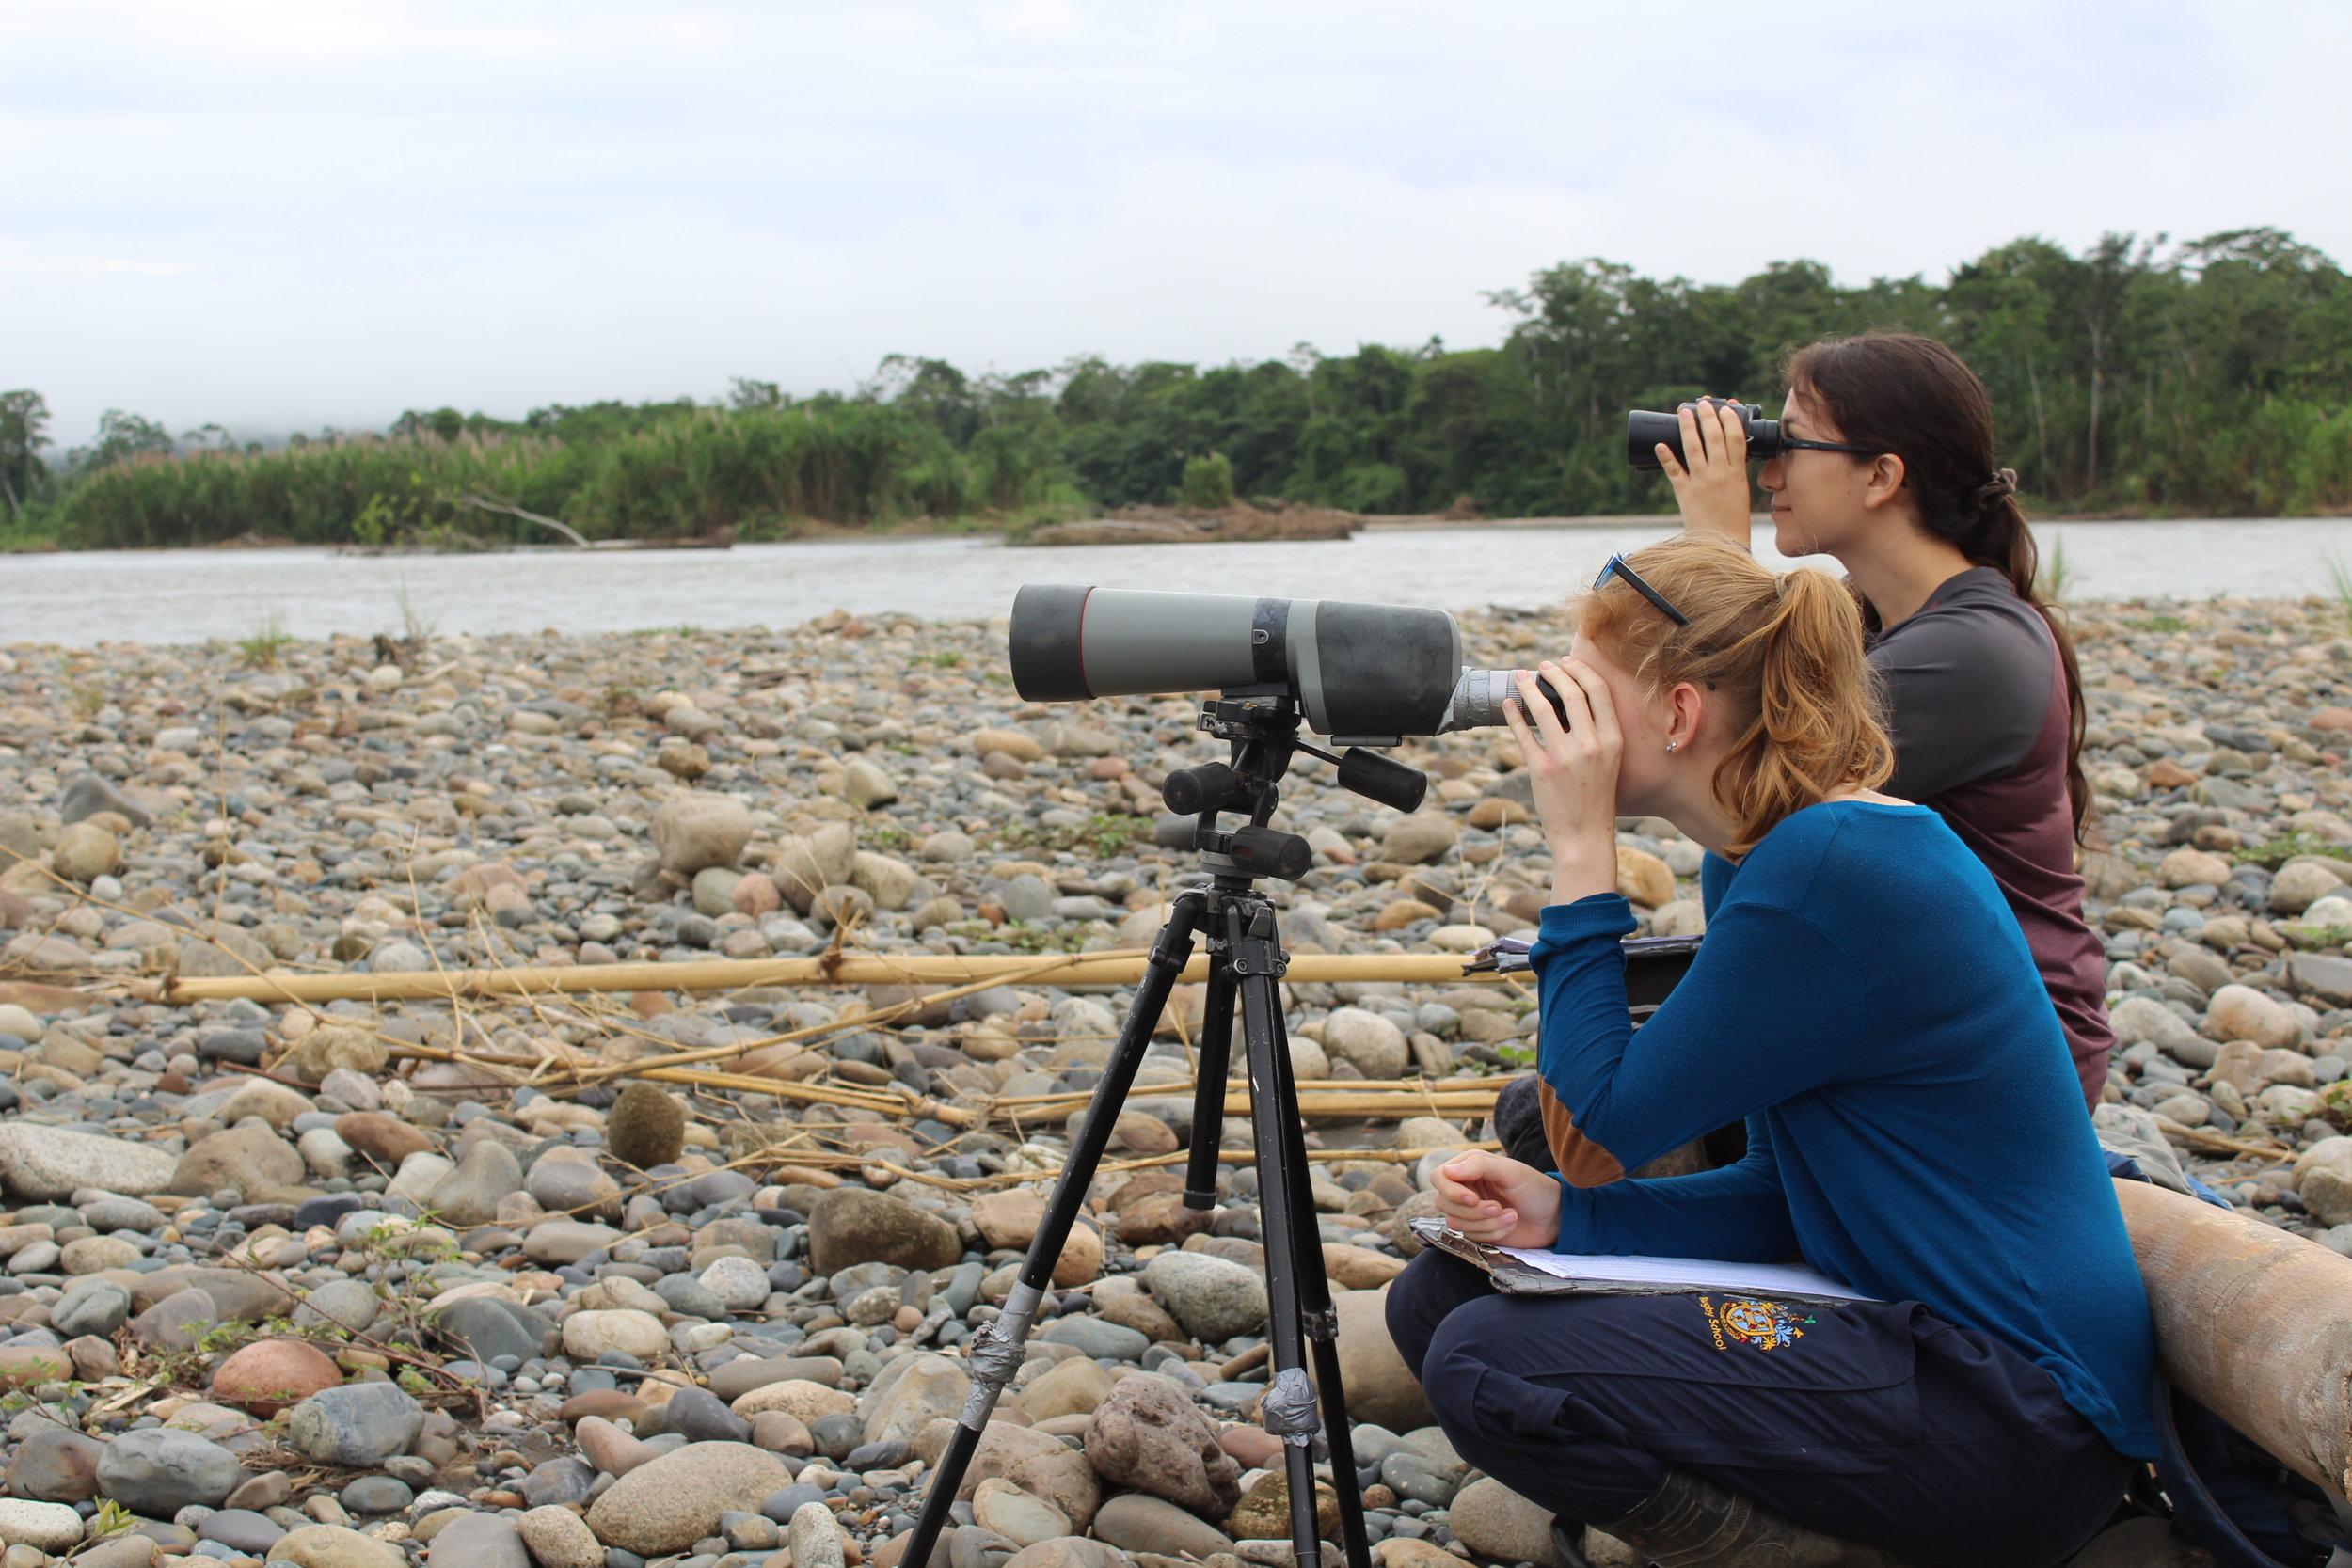 Monitoring the clay lick. Photo credit: Kristi Foster.